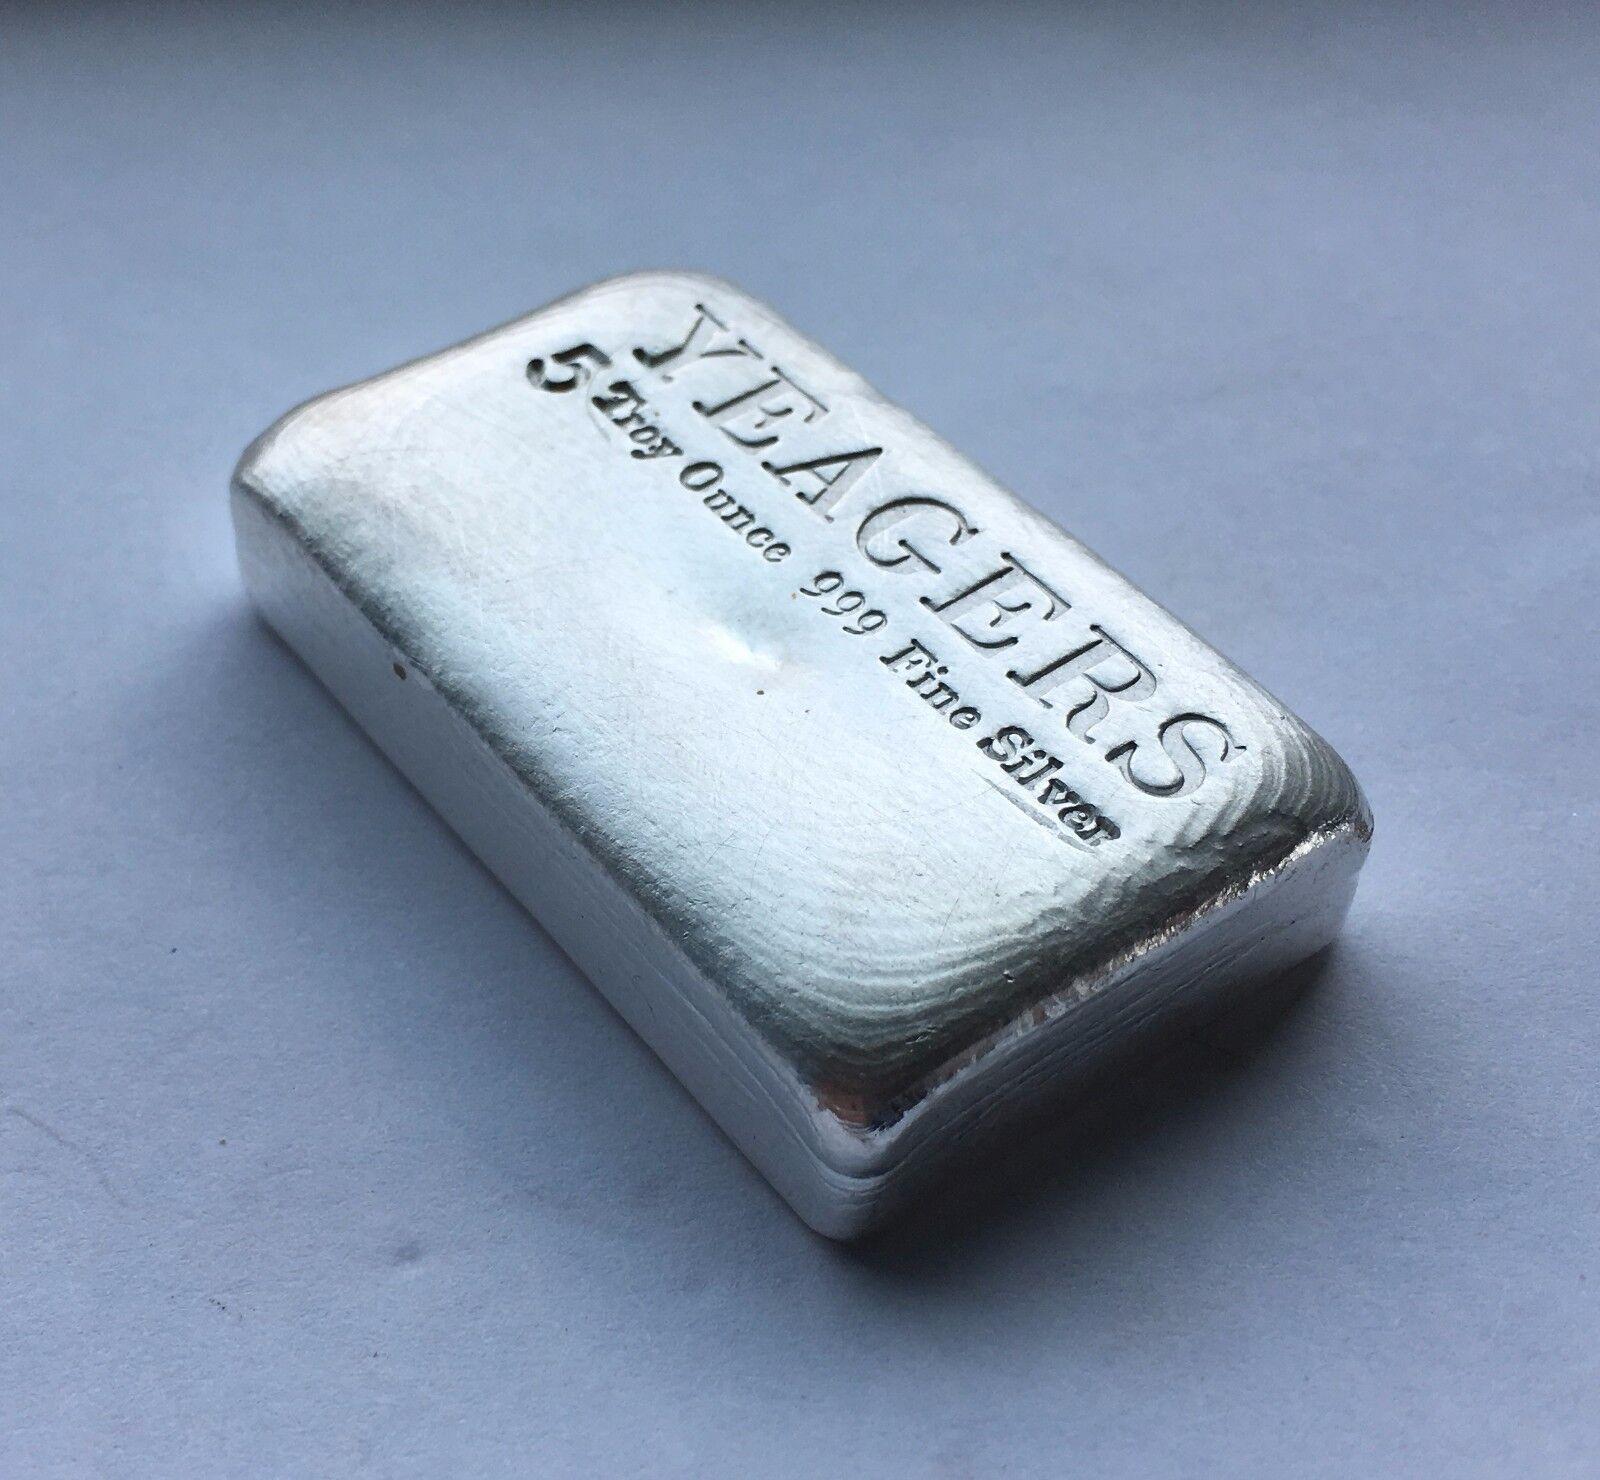 5 oz Hand Poured 999 Silver Bullion Bar by YPS (Bare Bones)